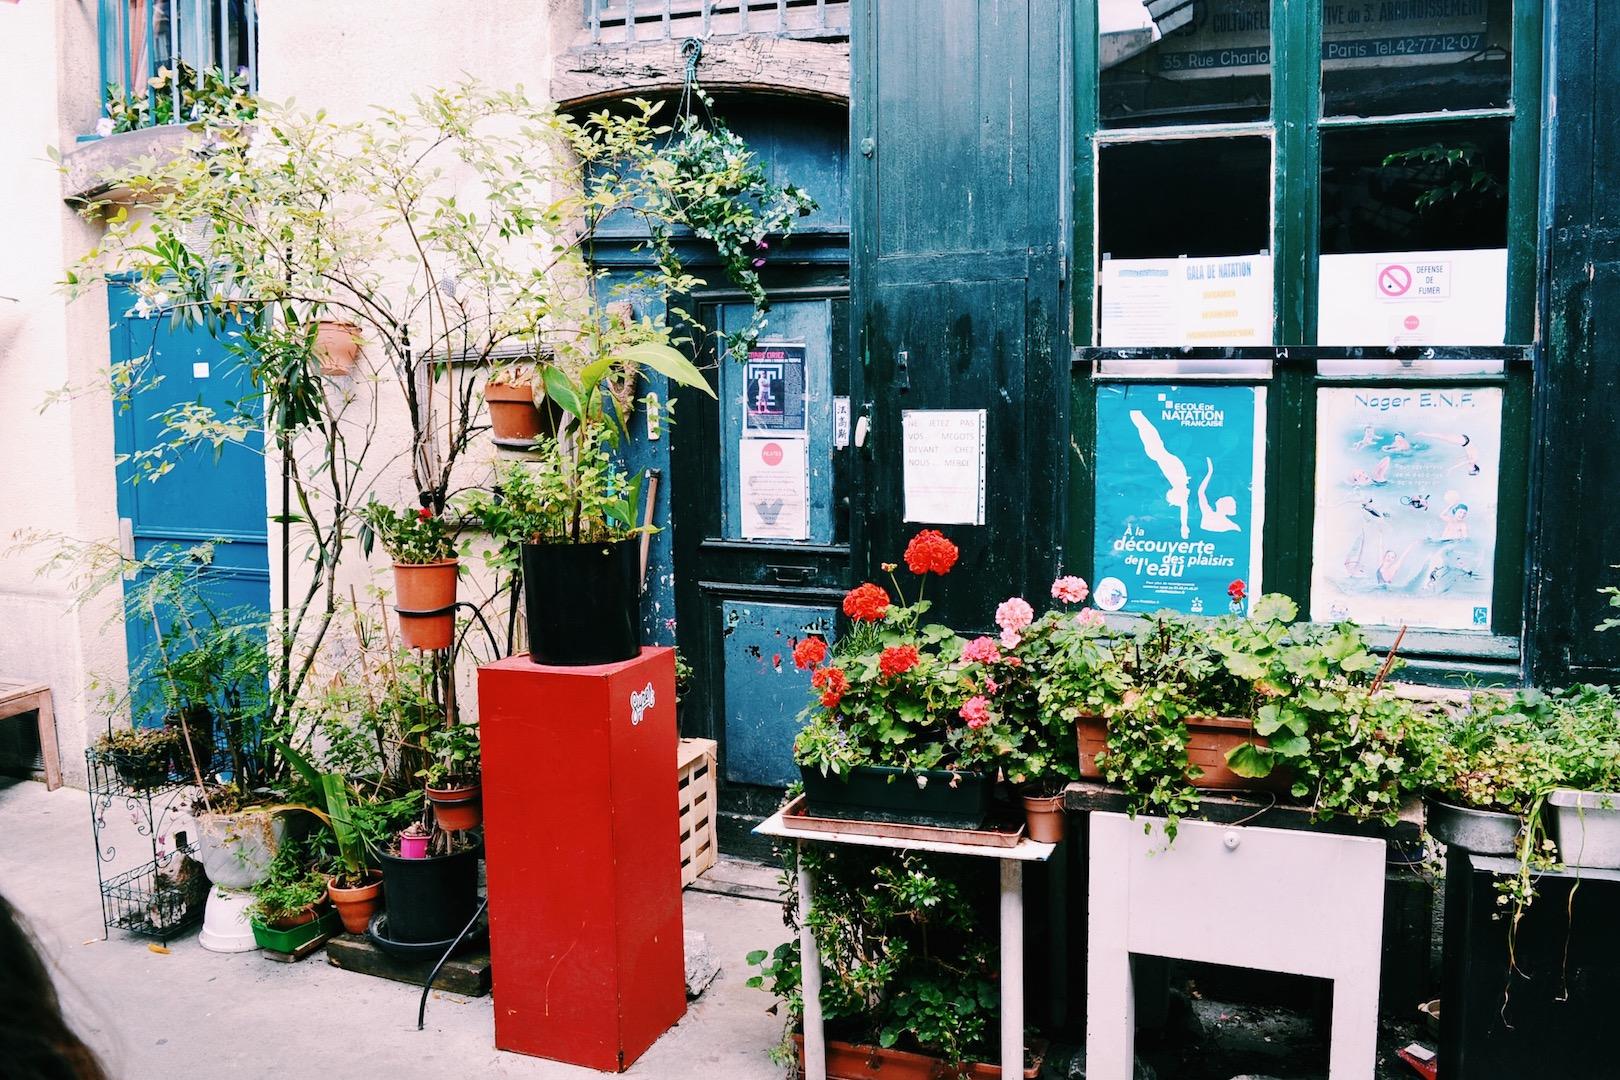 flowers-at-marche-des-enfants-rouges.JPG